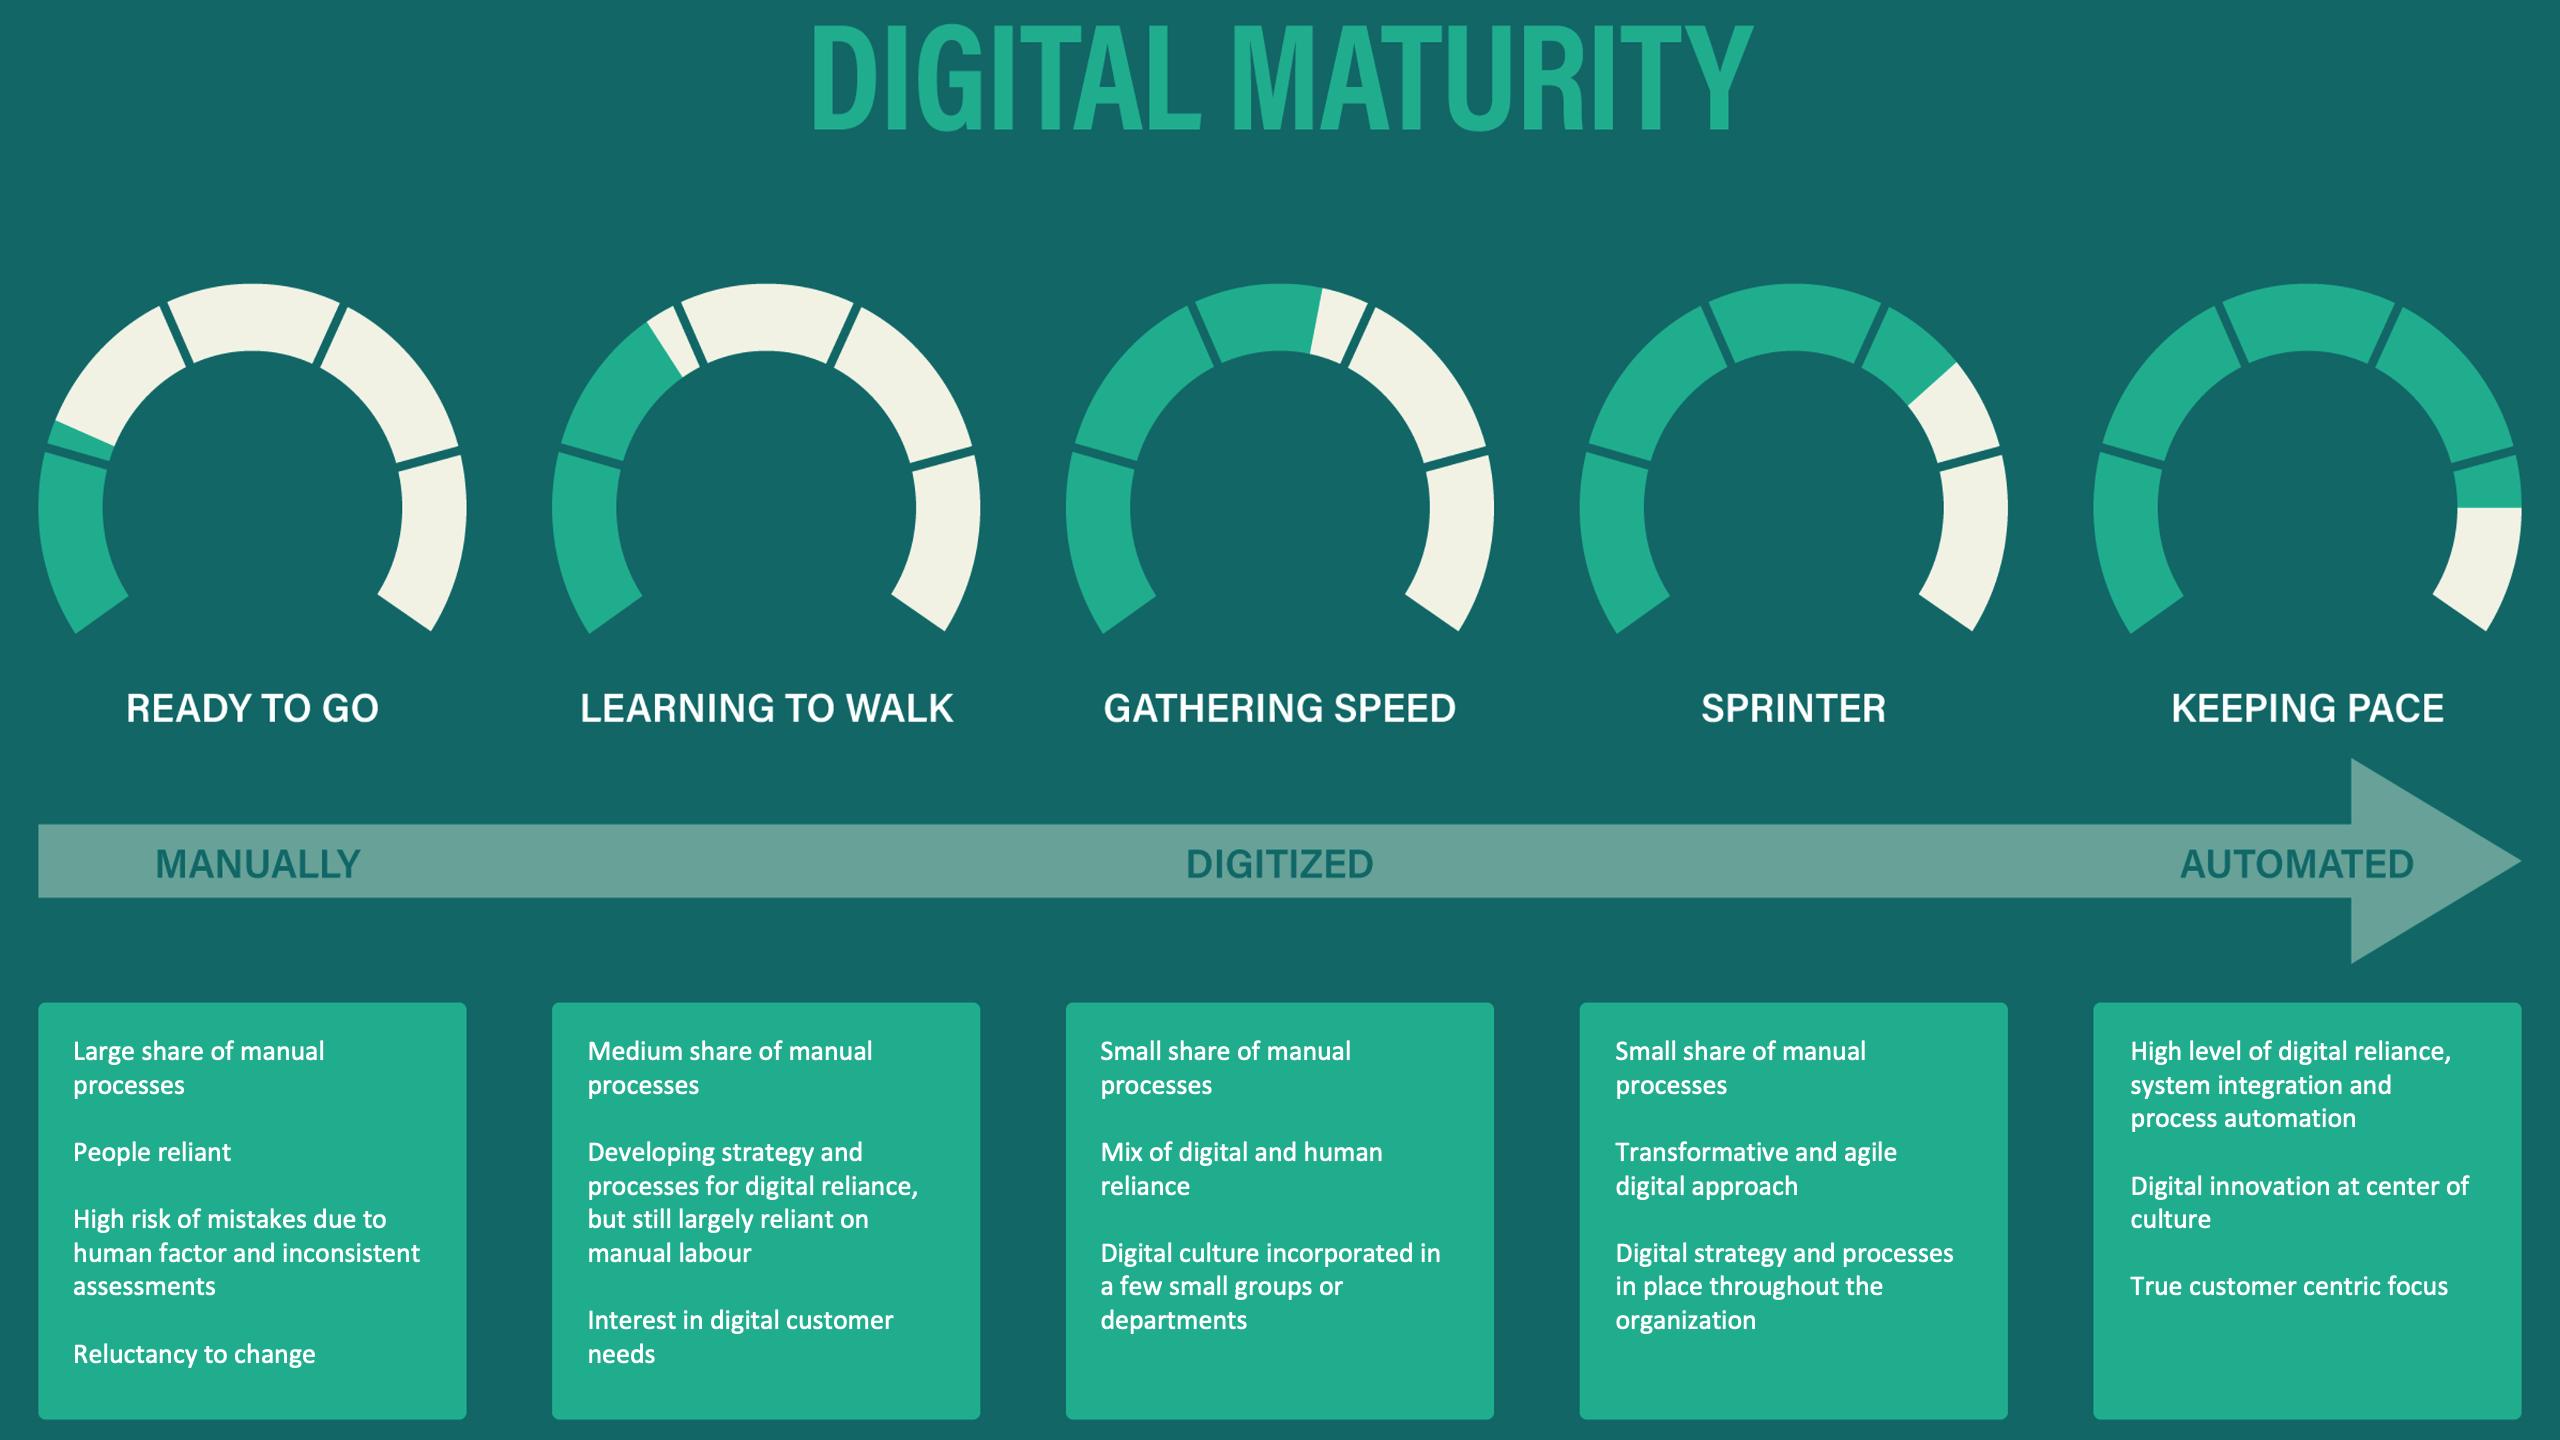 Digital Maturity 2